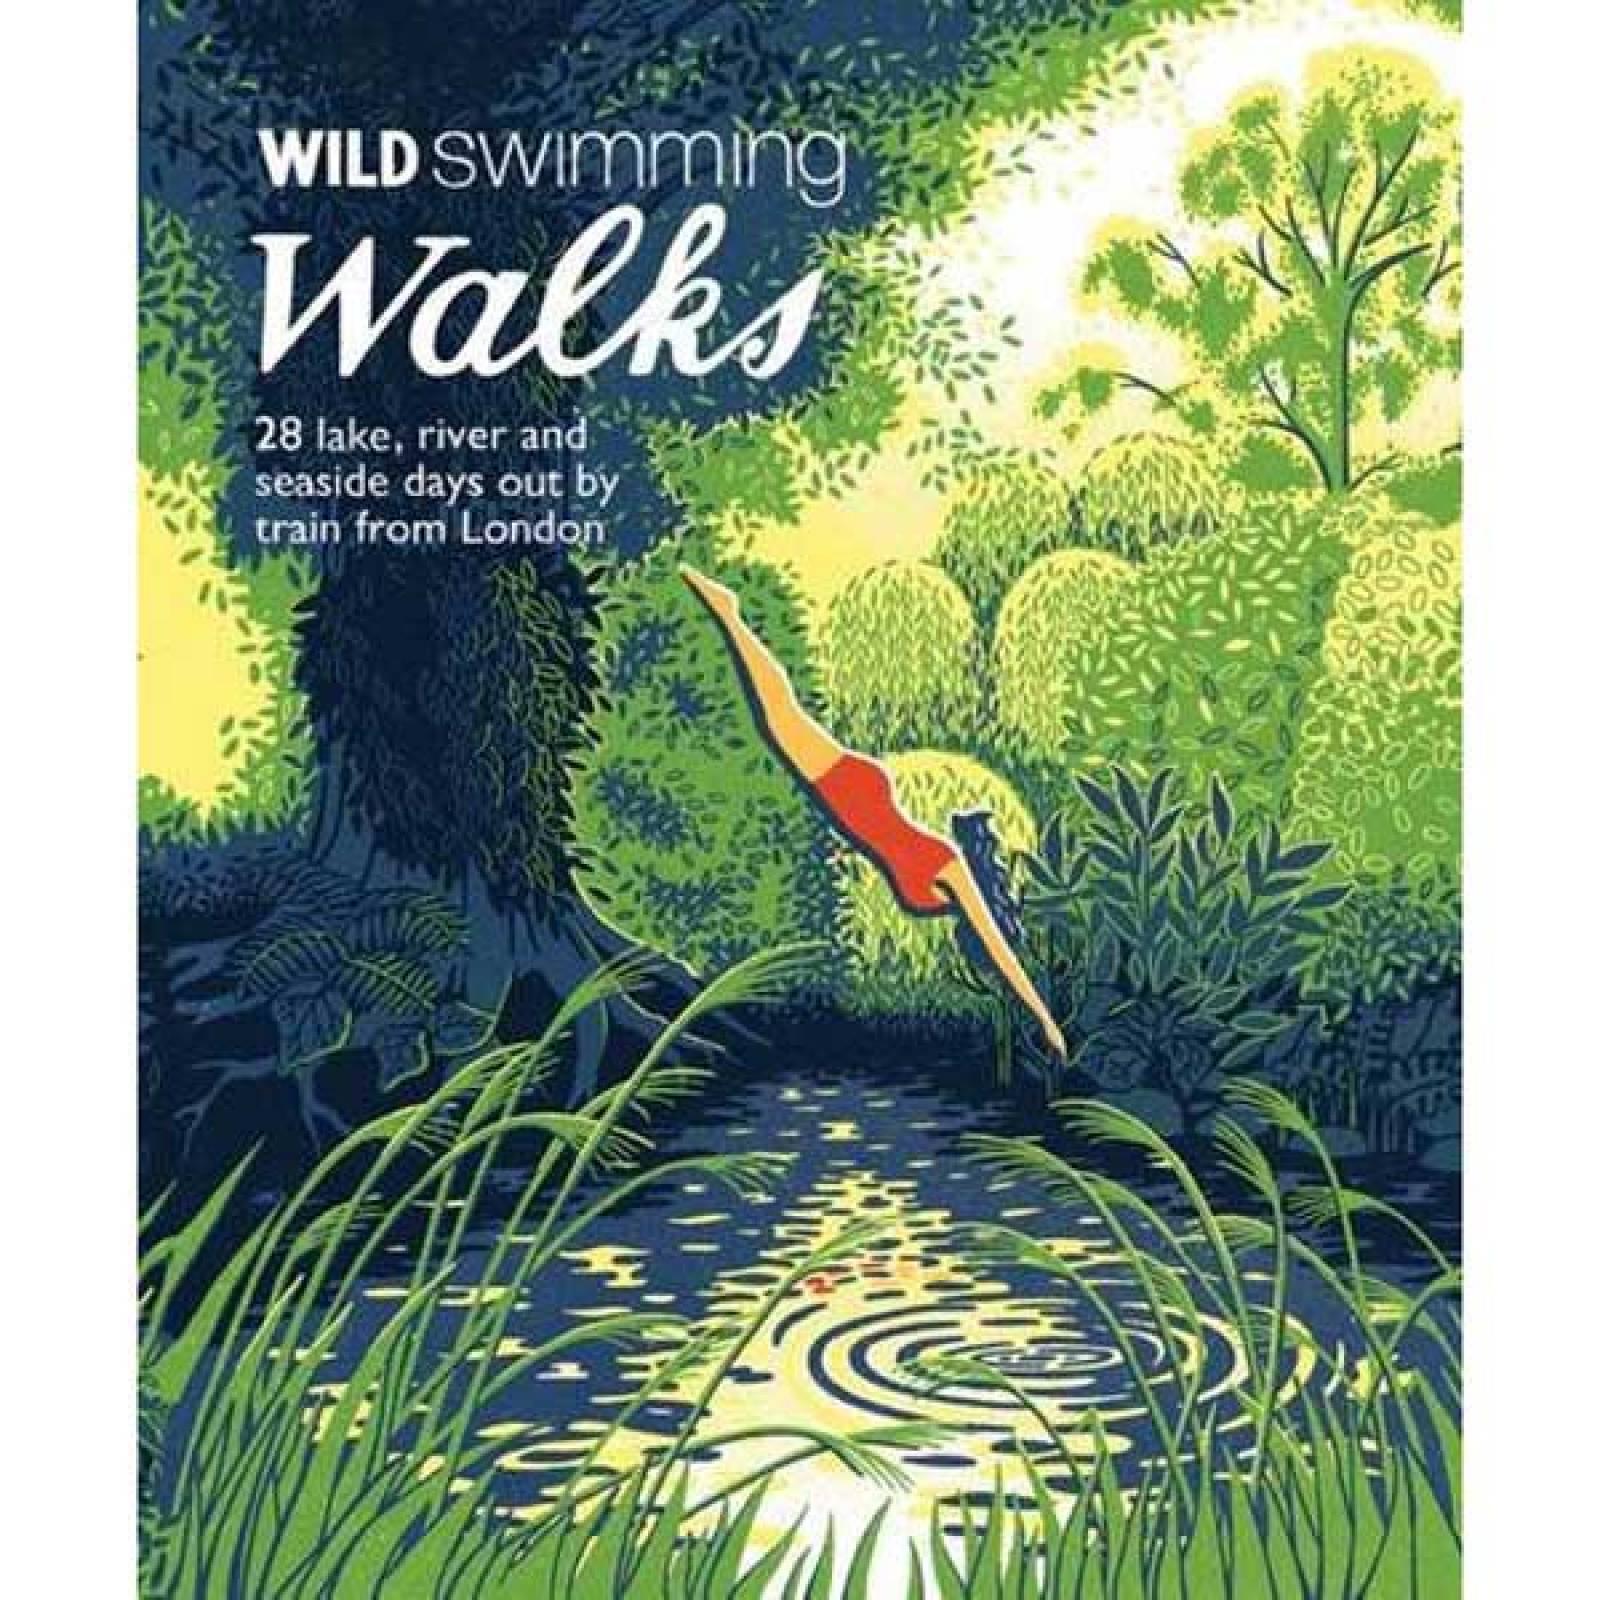 Wild Swimming Walks - Paperback Book